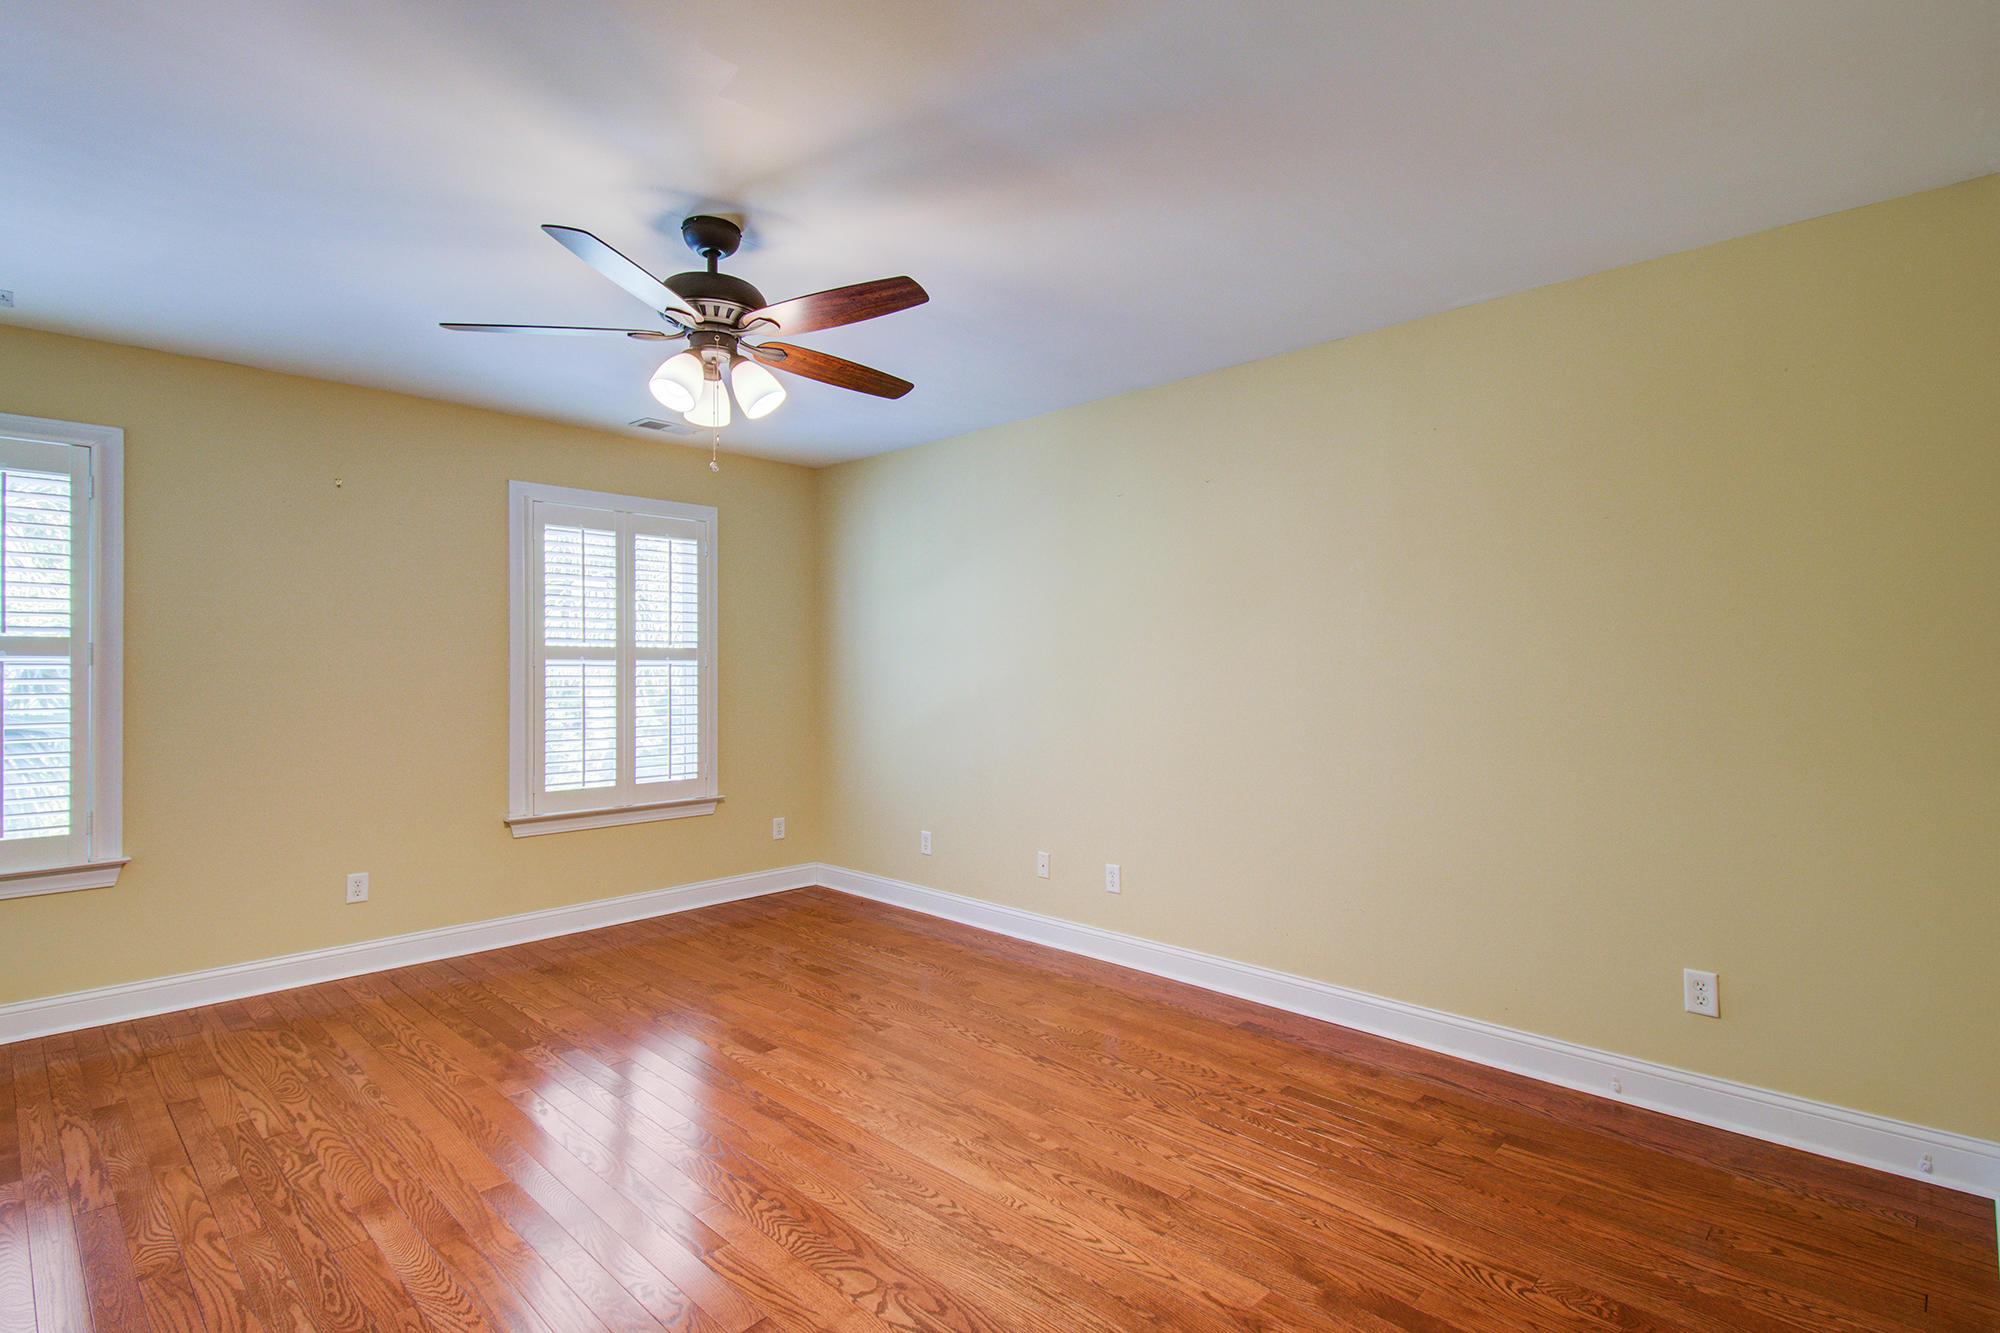 Center Park Homes For Sale - 950 Crossing, Daniel Island, SC - 27